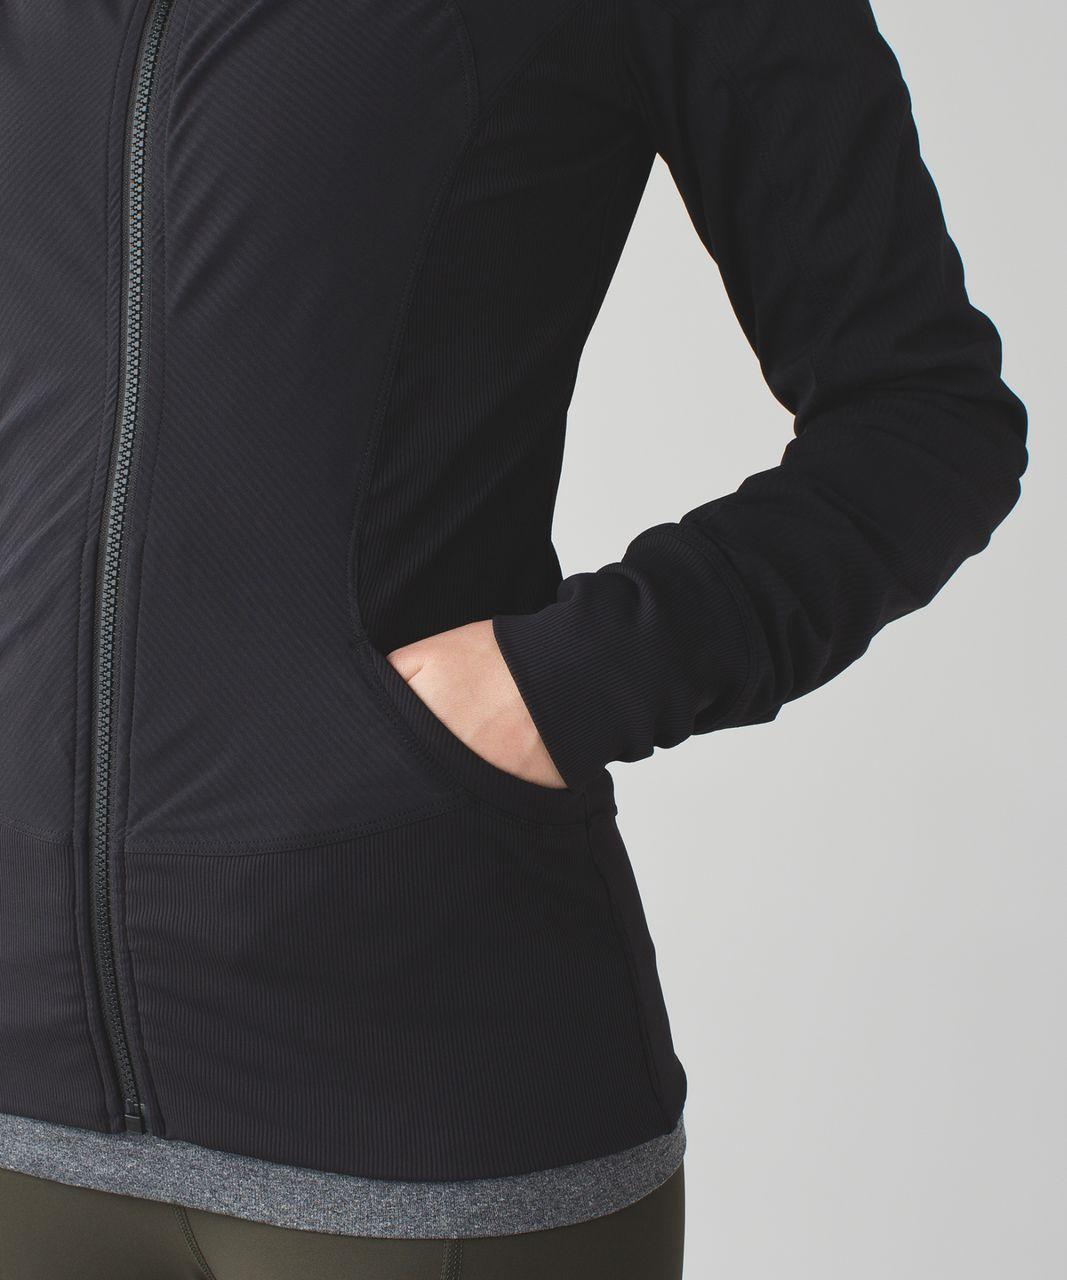 Lululemon In Flux Jacket - Black (First Release)